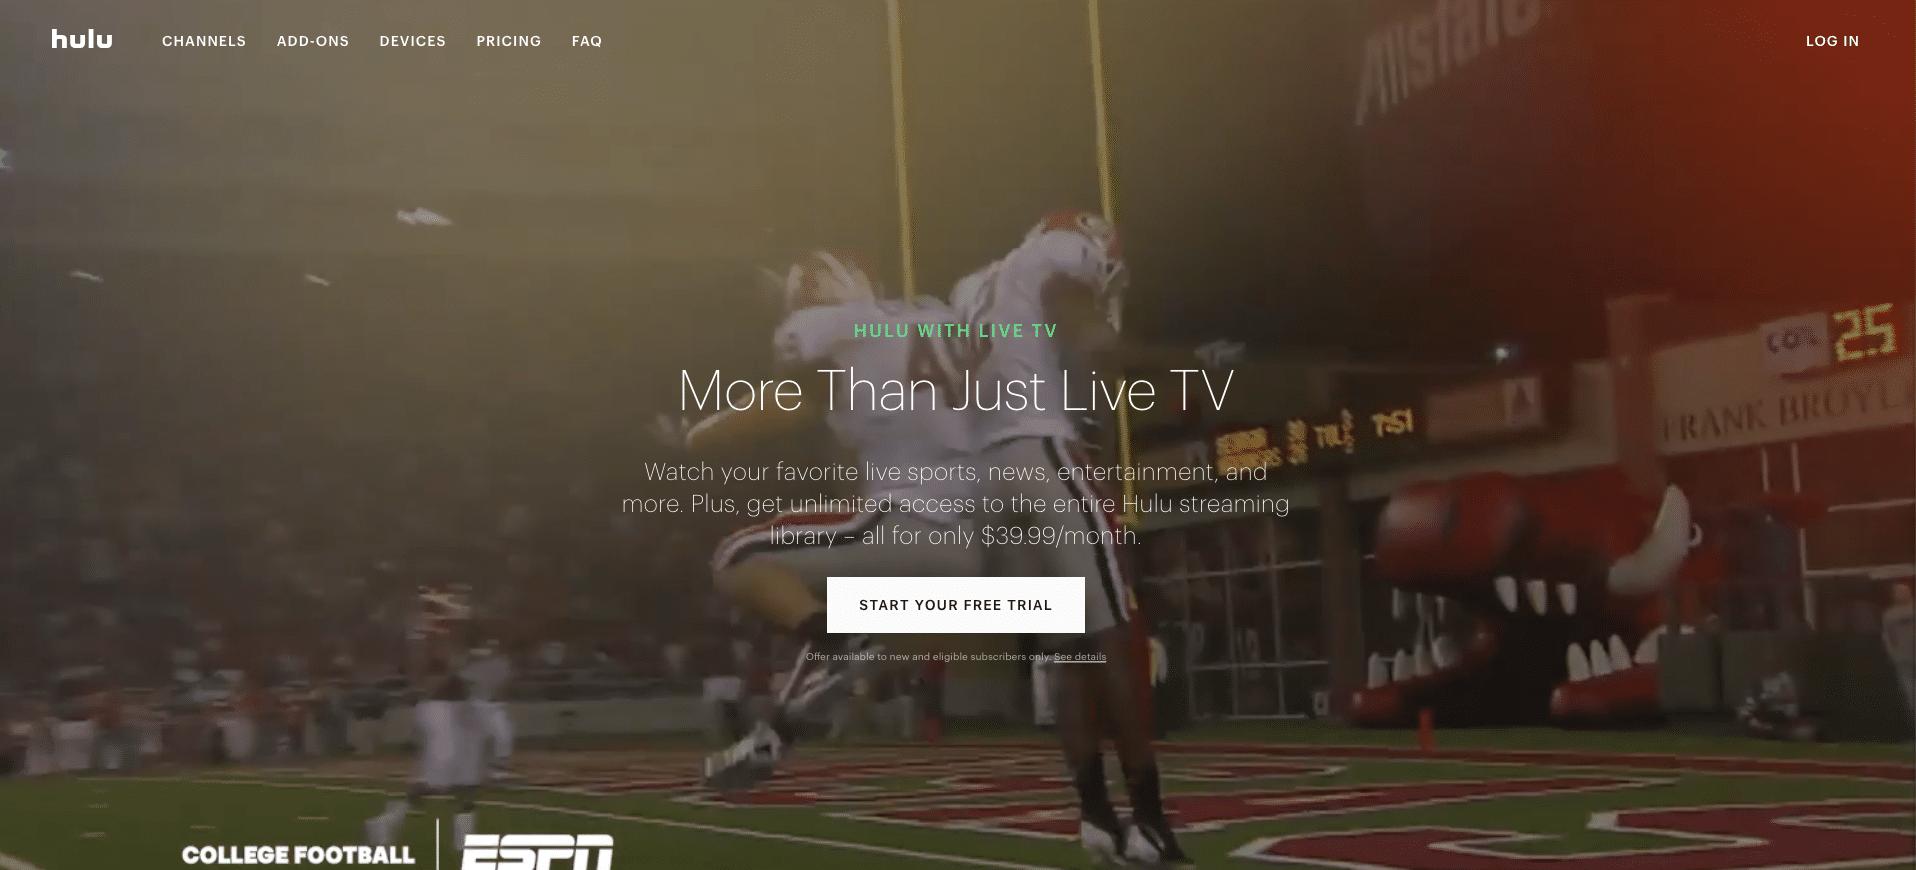 hulu with live tv